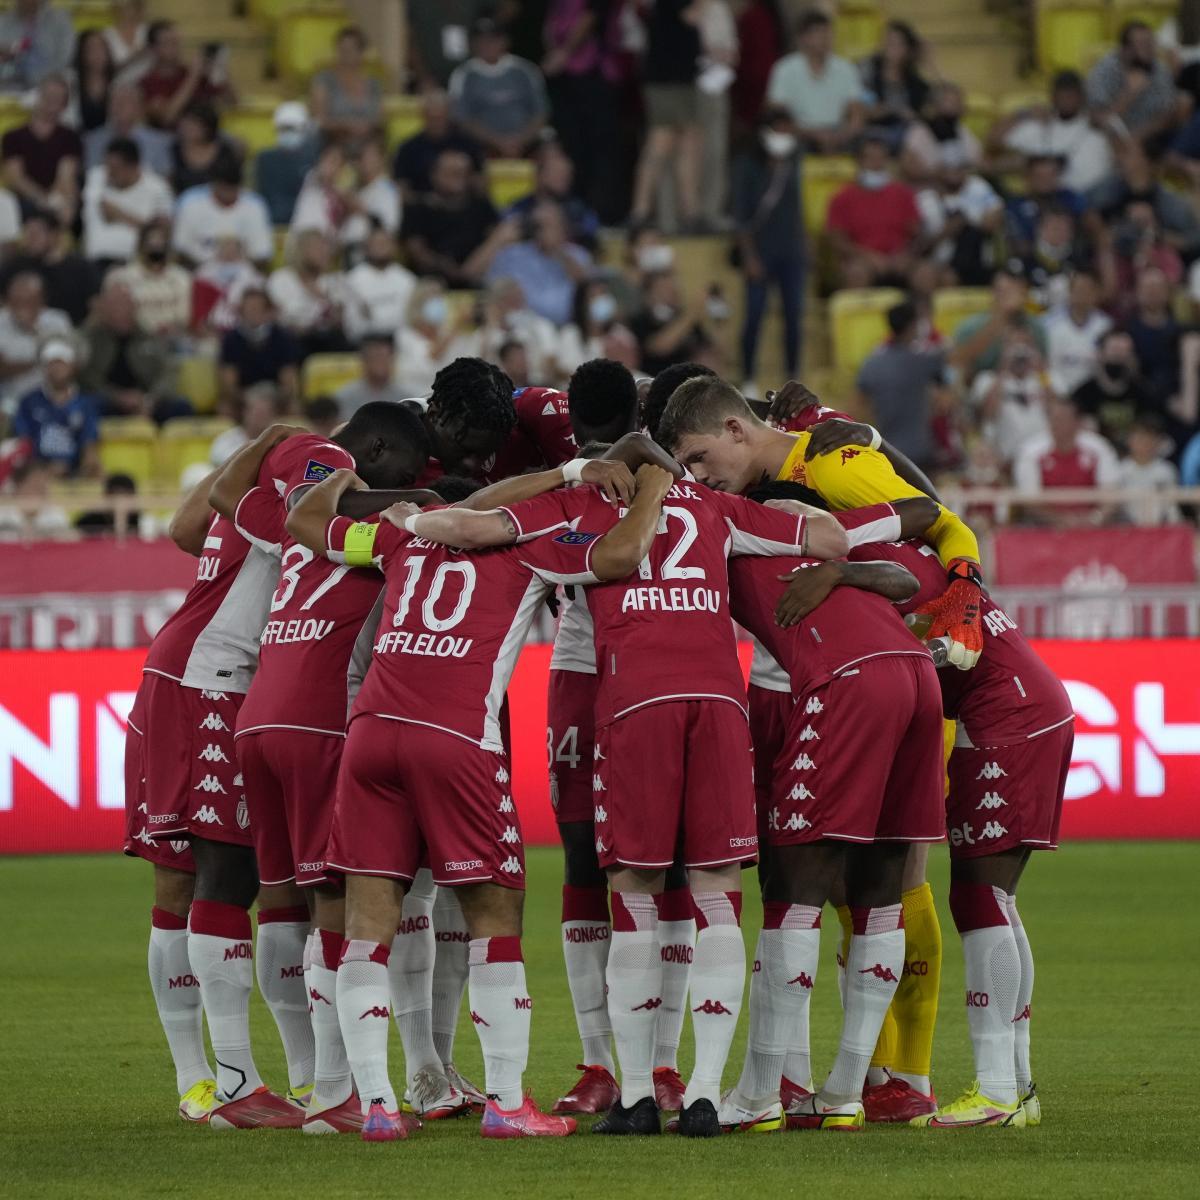 Photo by AS Monaco